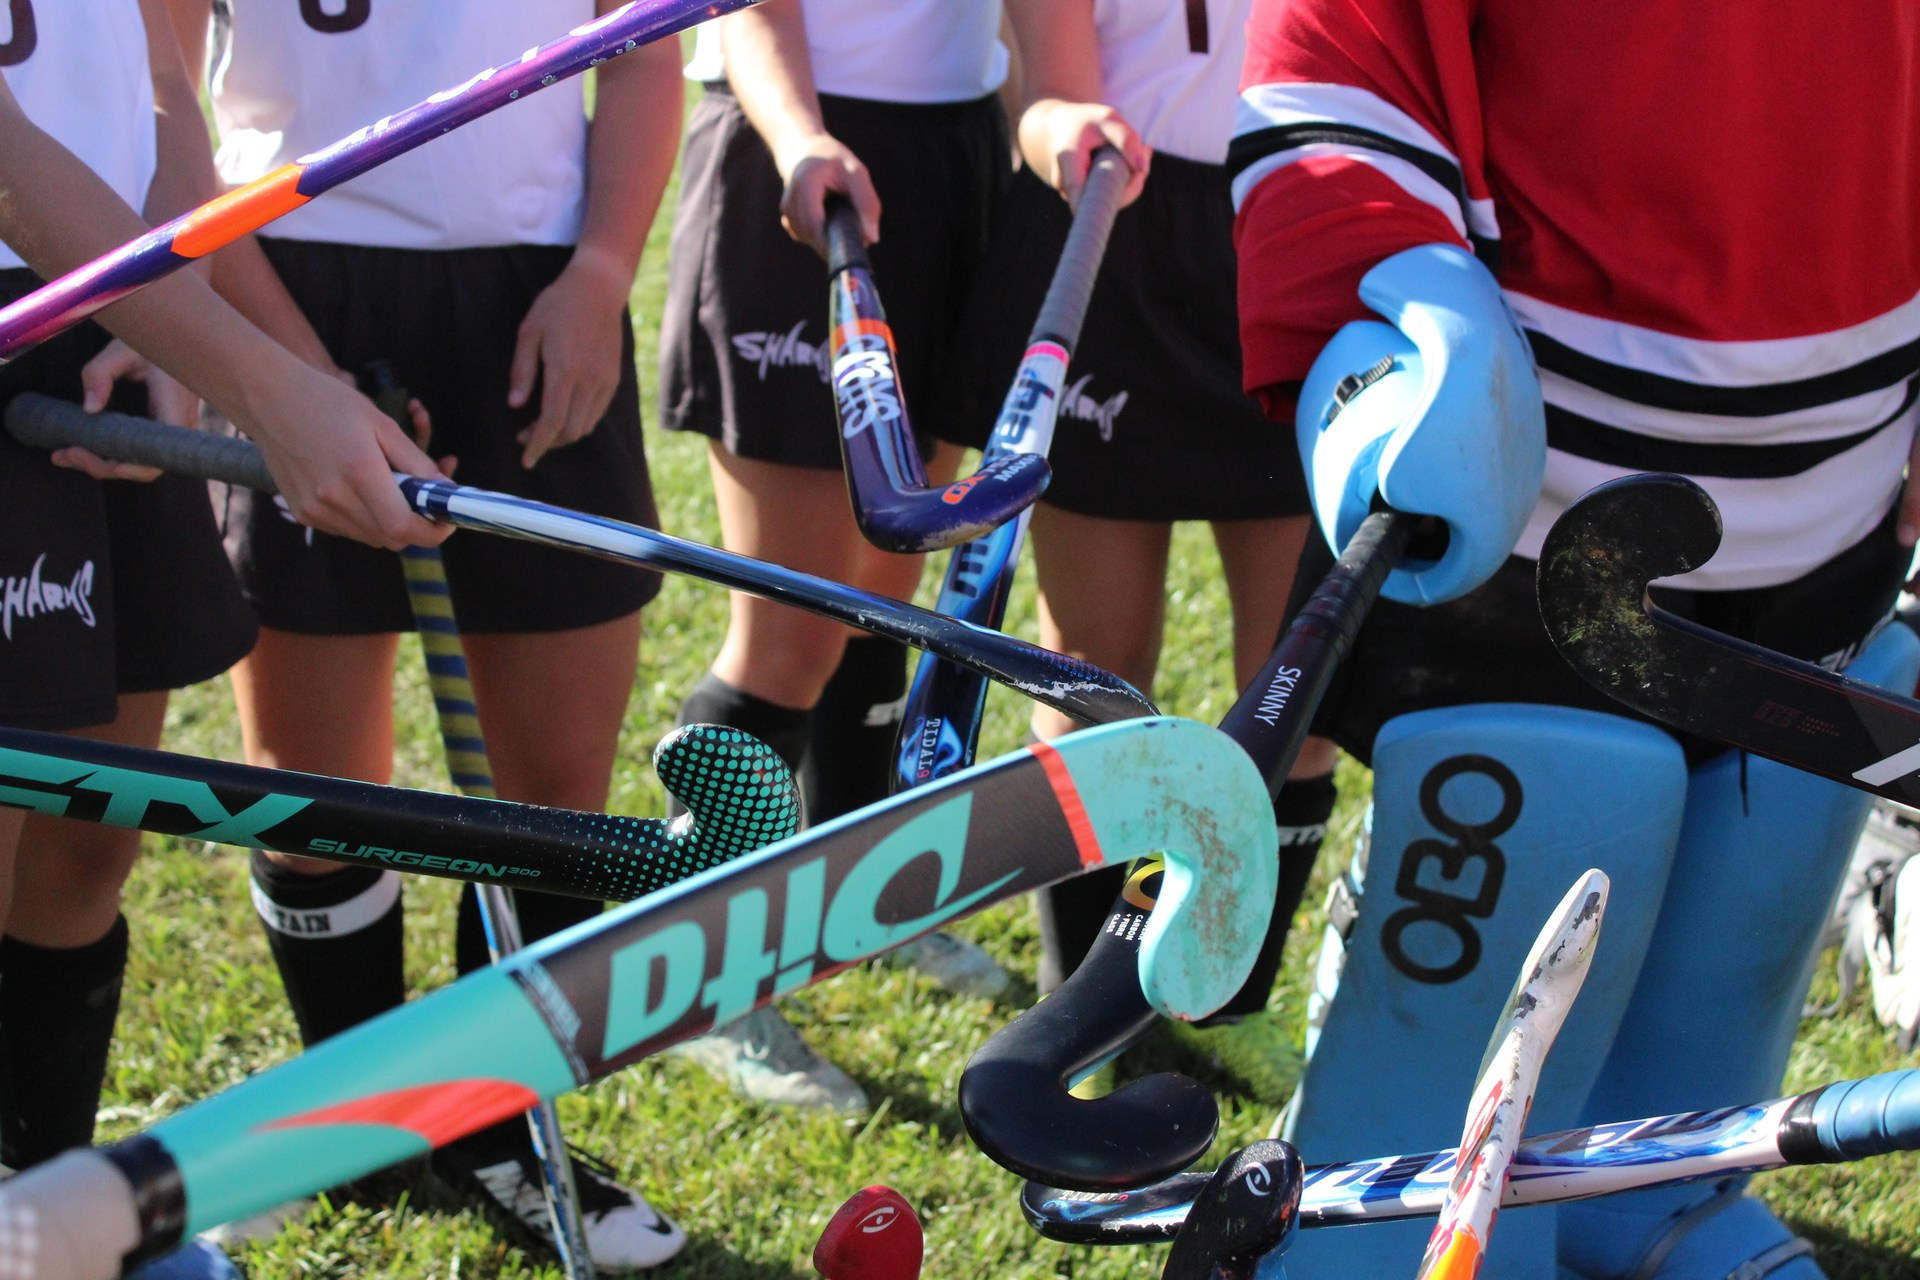 field hockey sticks huddle